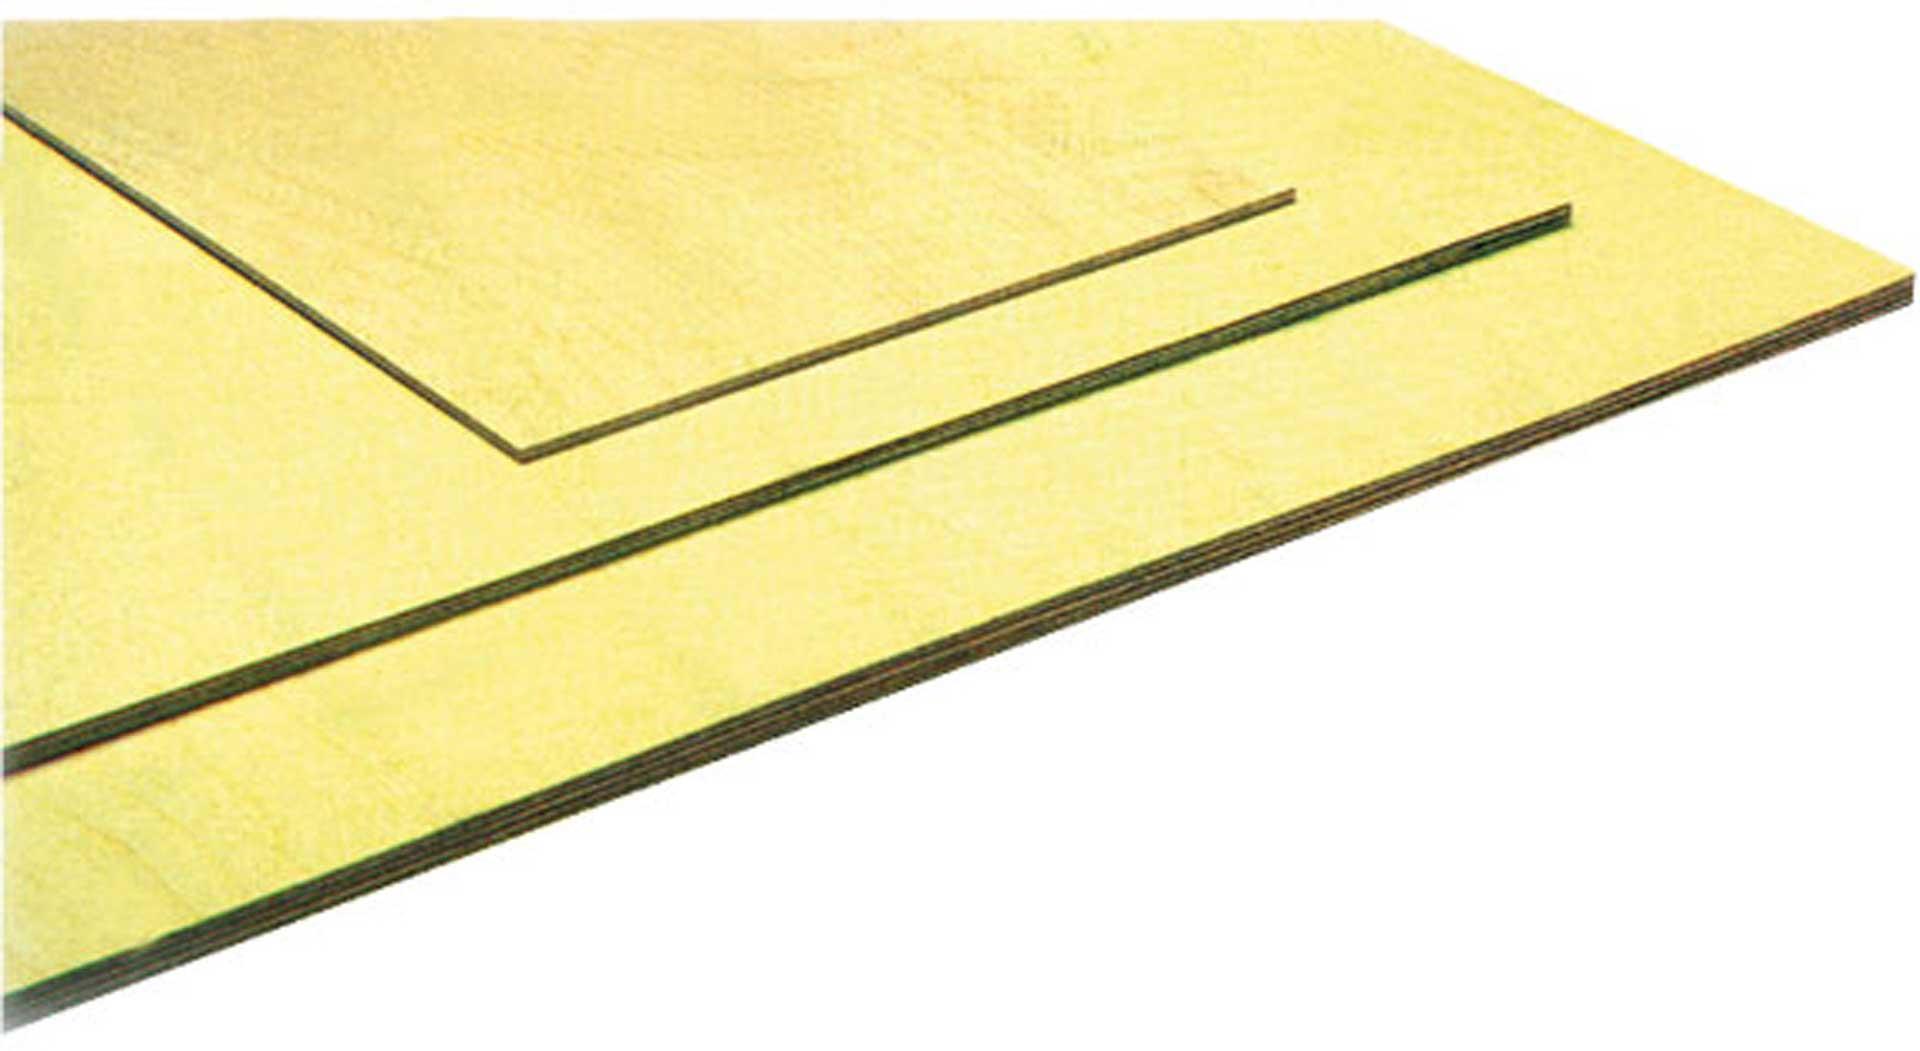 MODELLBAU LINDINGER BIRCH-SPERRYWOOD 1,5/300/1000MM